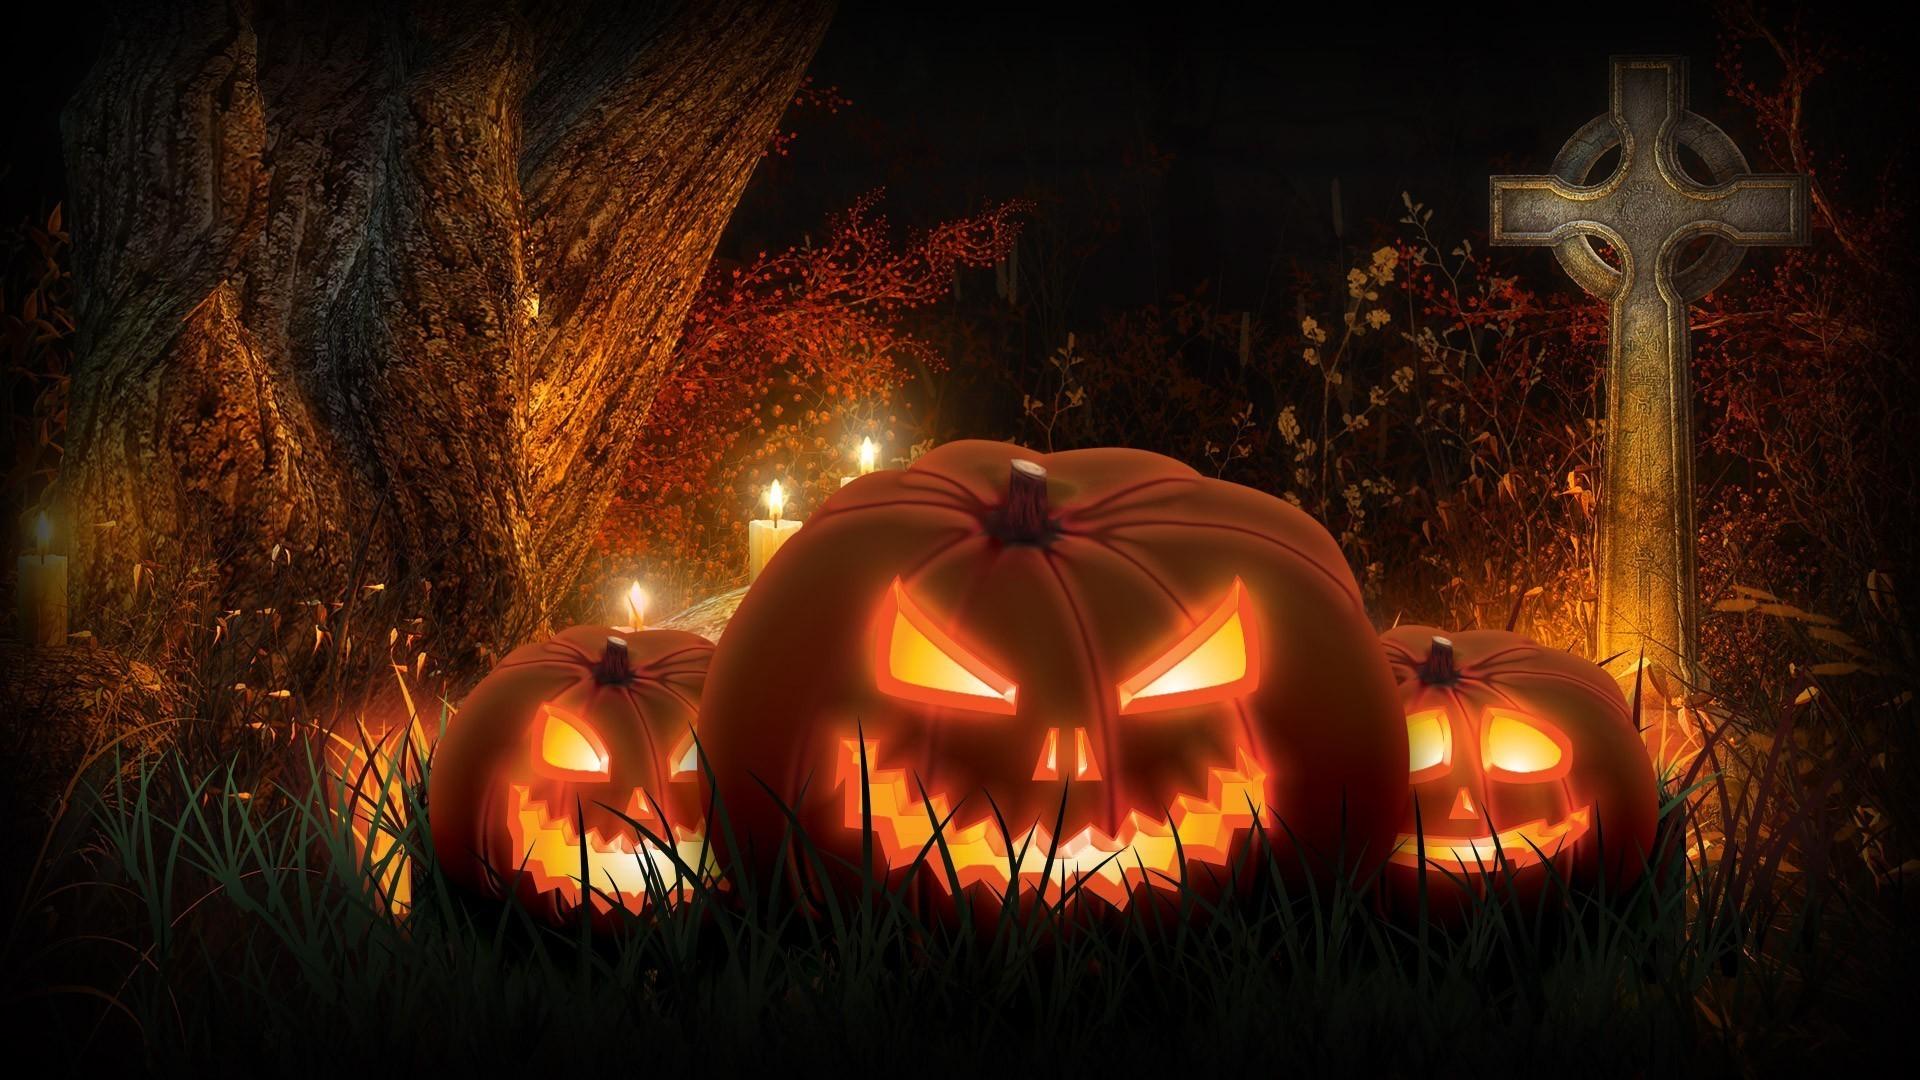 Halloween Wallpaper For Facebook